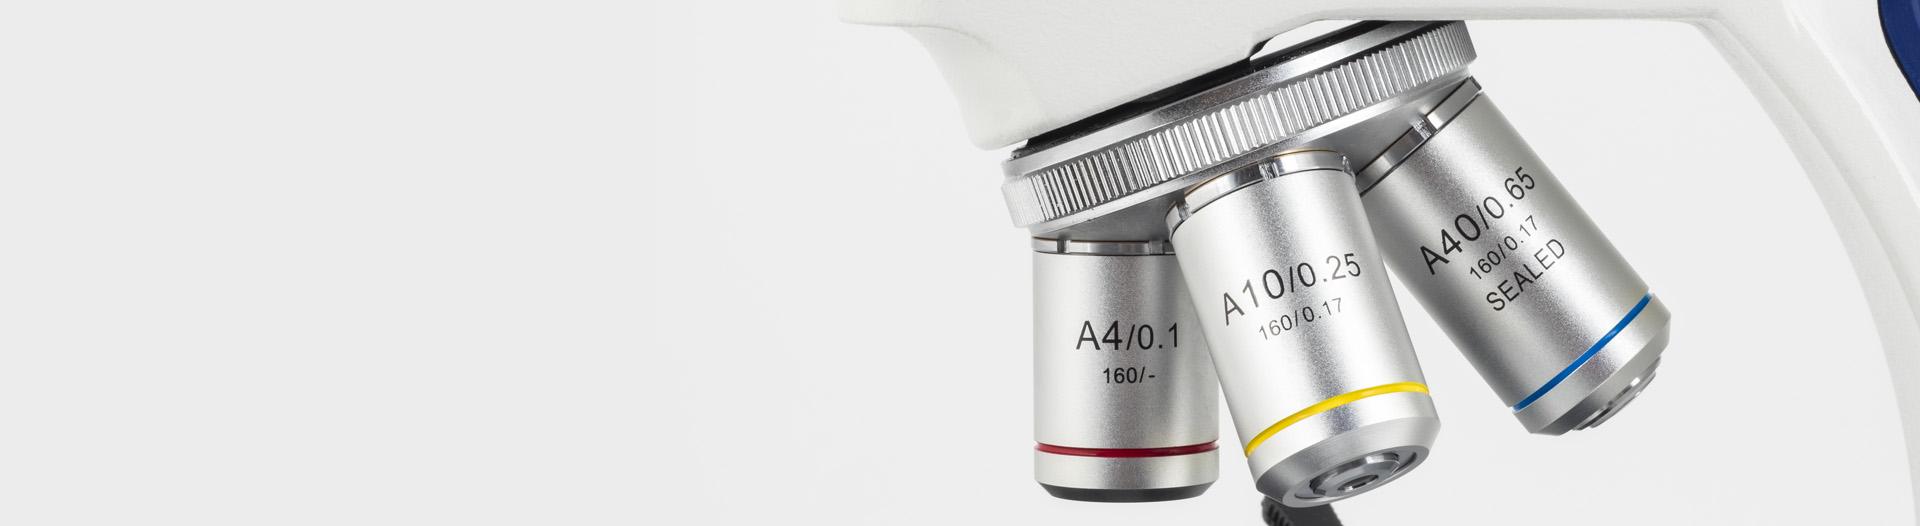 SILVER 100 microscope Optics